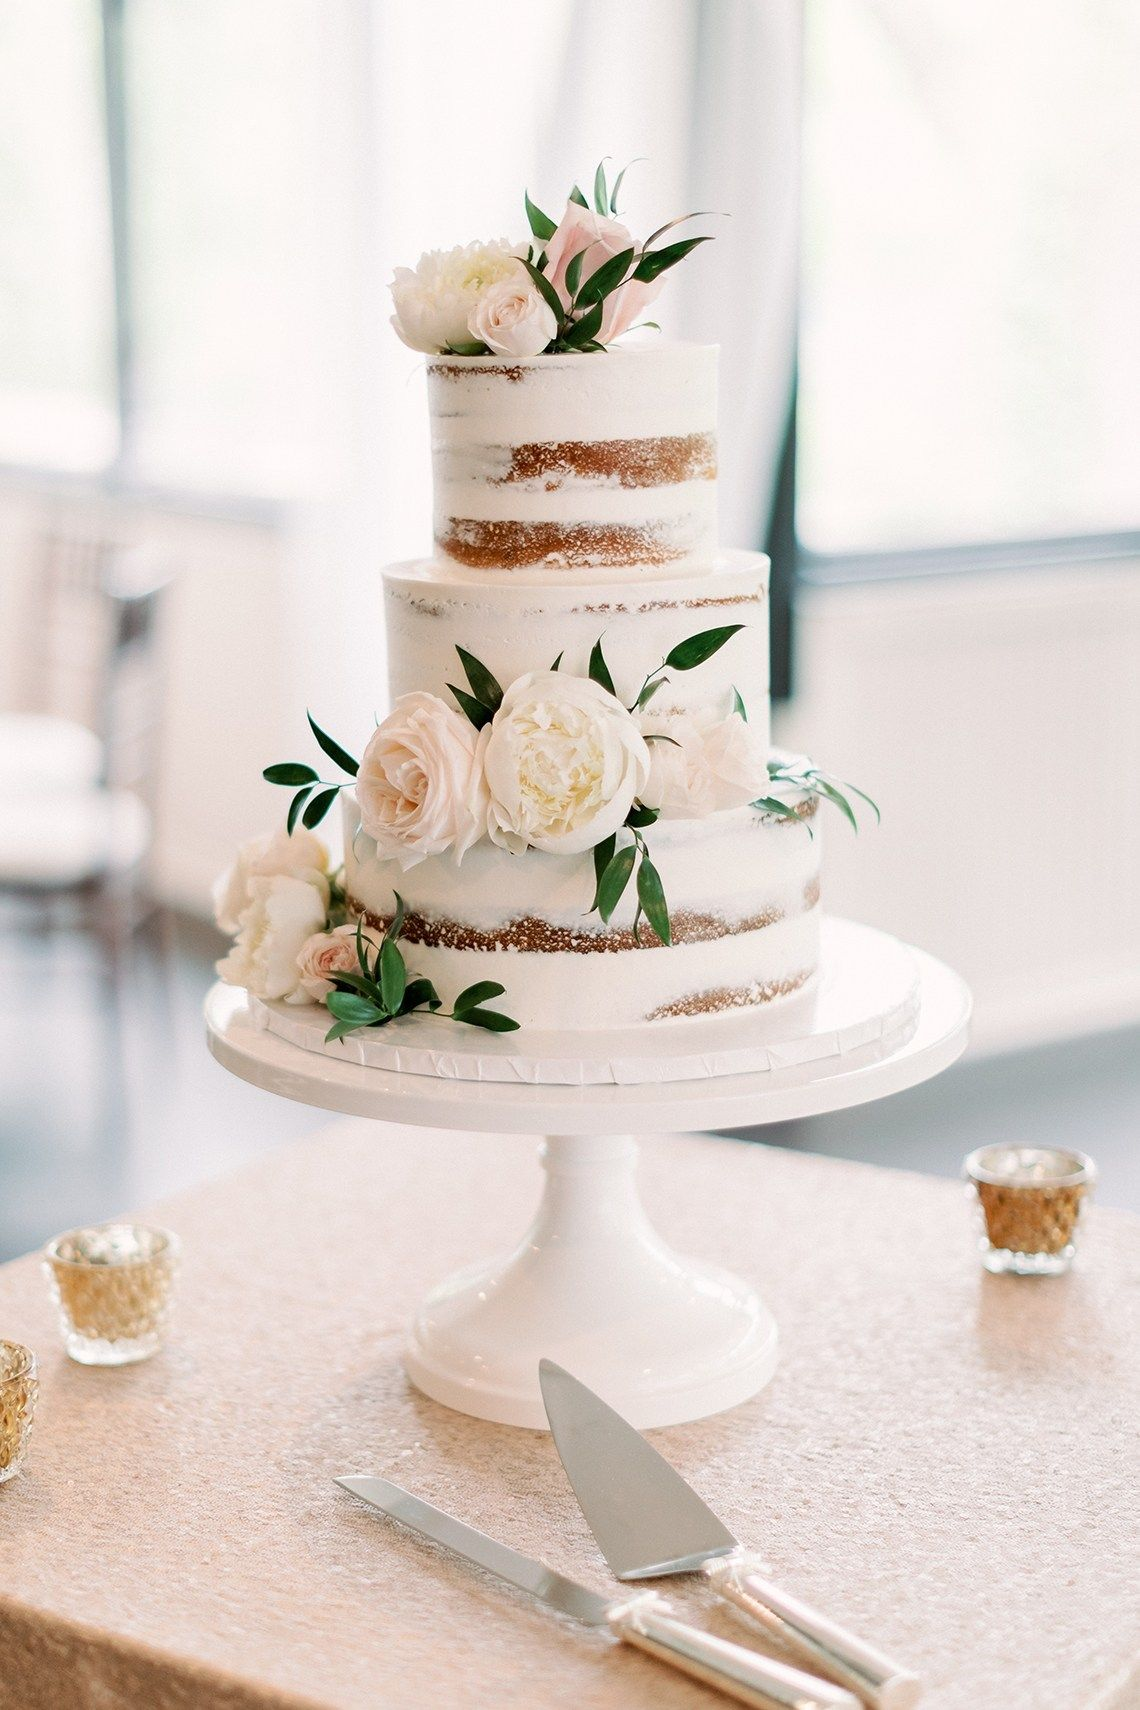 28 Trendy Summer Wedding Cakes that Speak to the Season